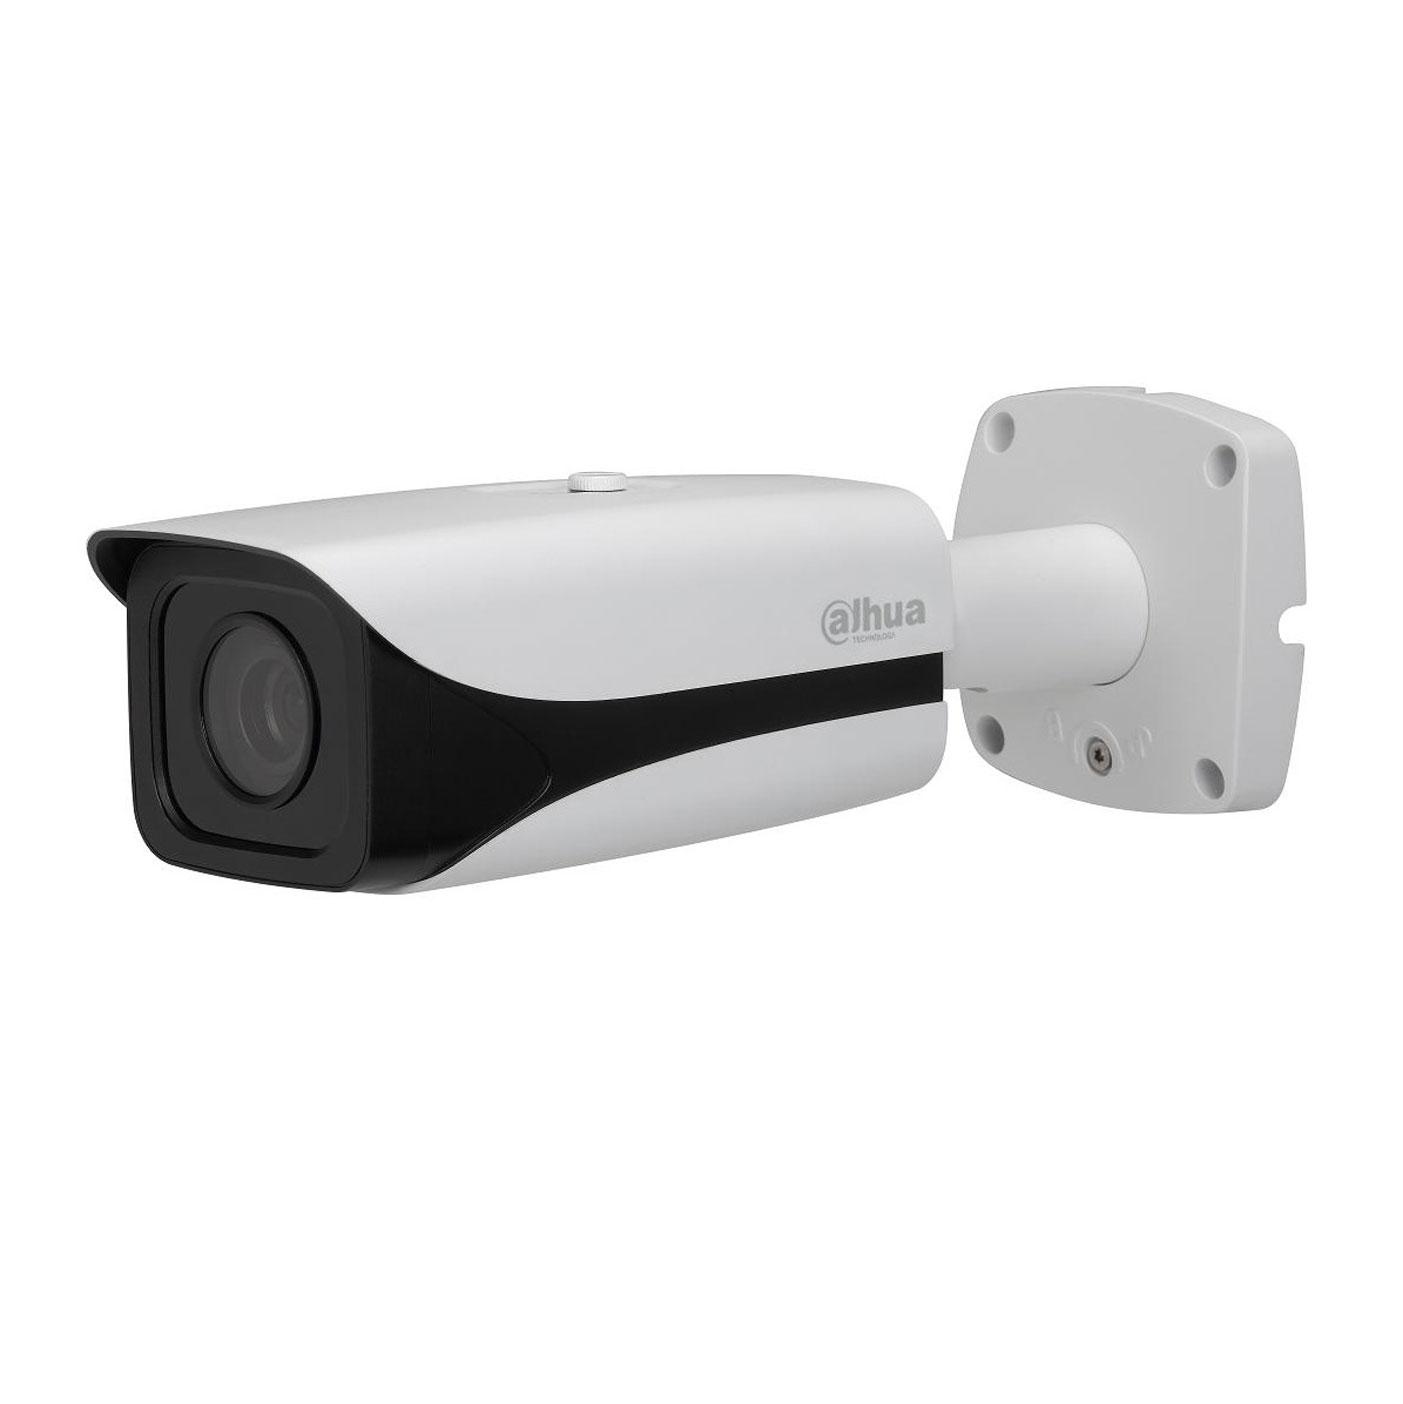 12 Megapiksel Ultra HD bullet IP Kamera